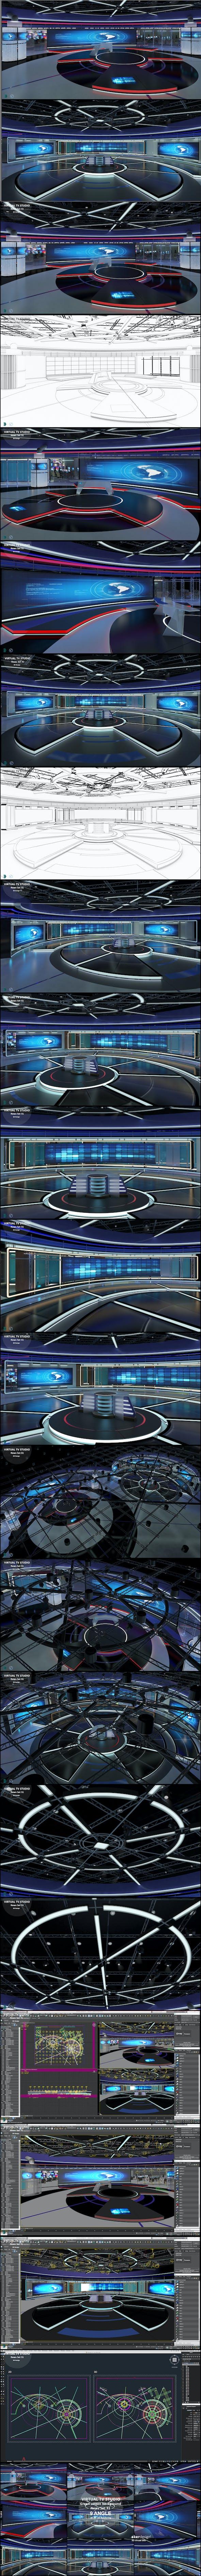 Virtual TV Studio News Set 31 - 3DOcean Item for Sale